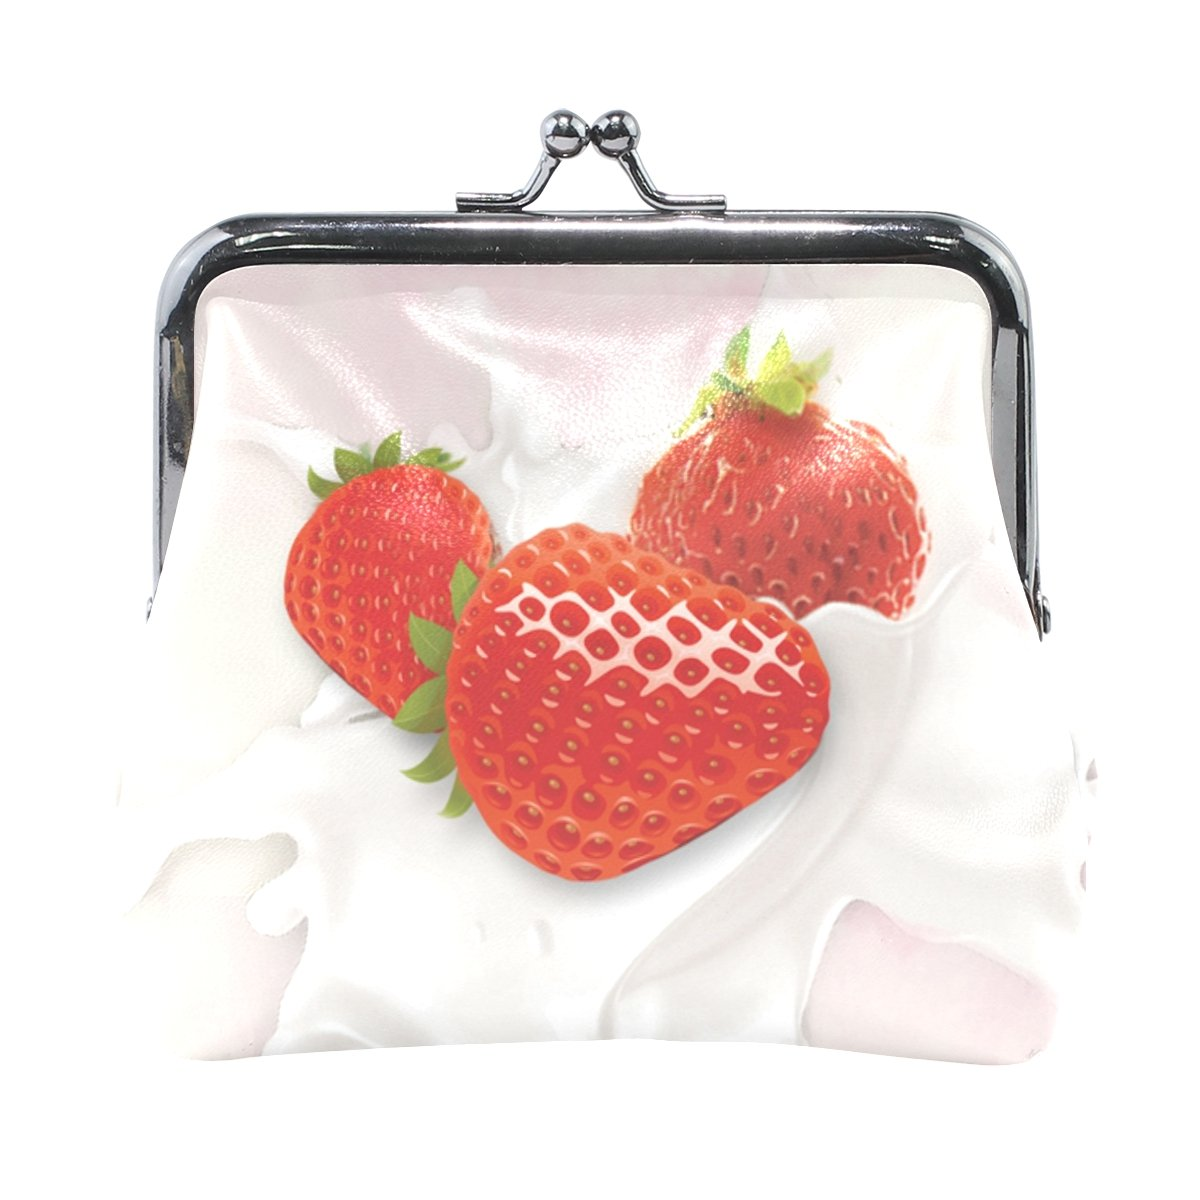 Amazon.com: portafolios lindo mujer Fresa leche cartera ...